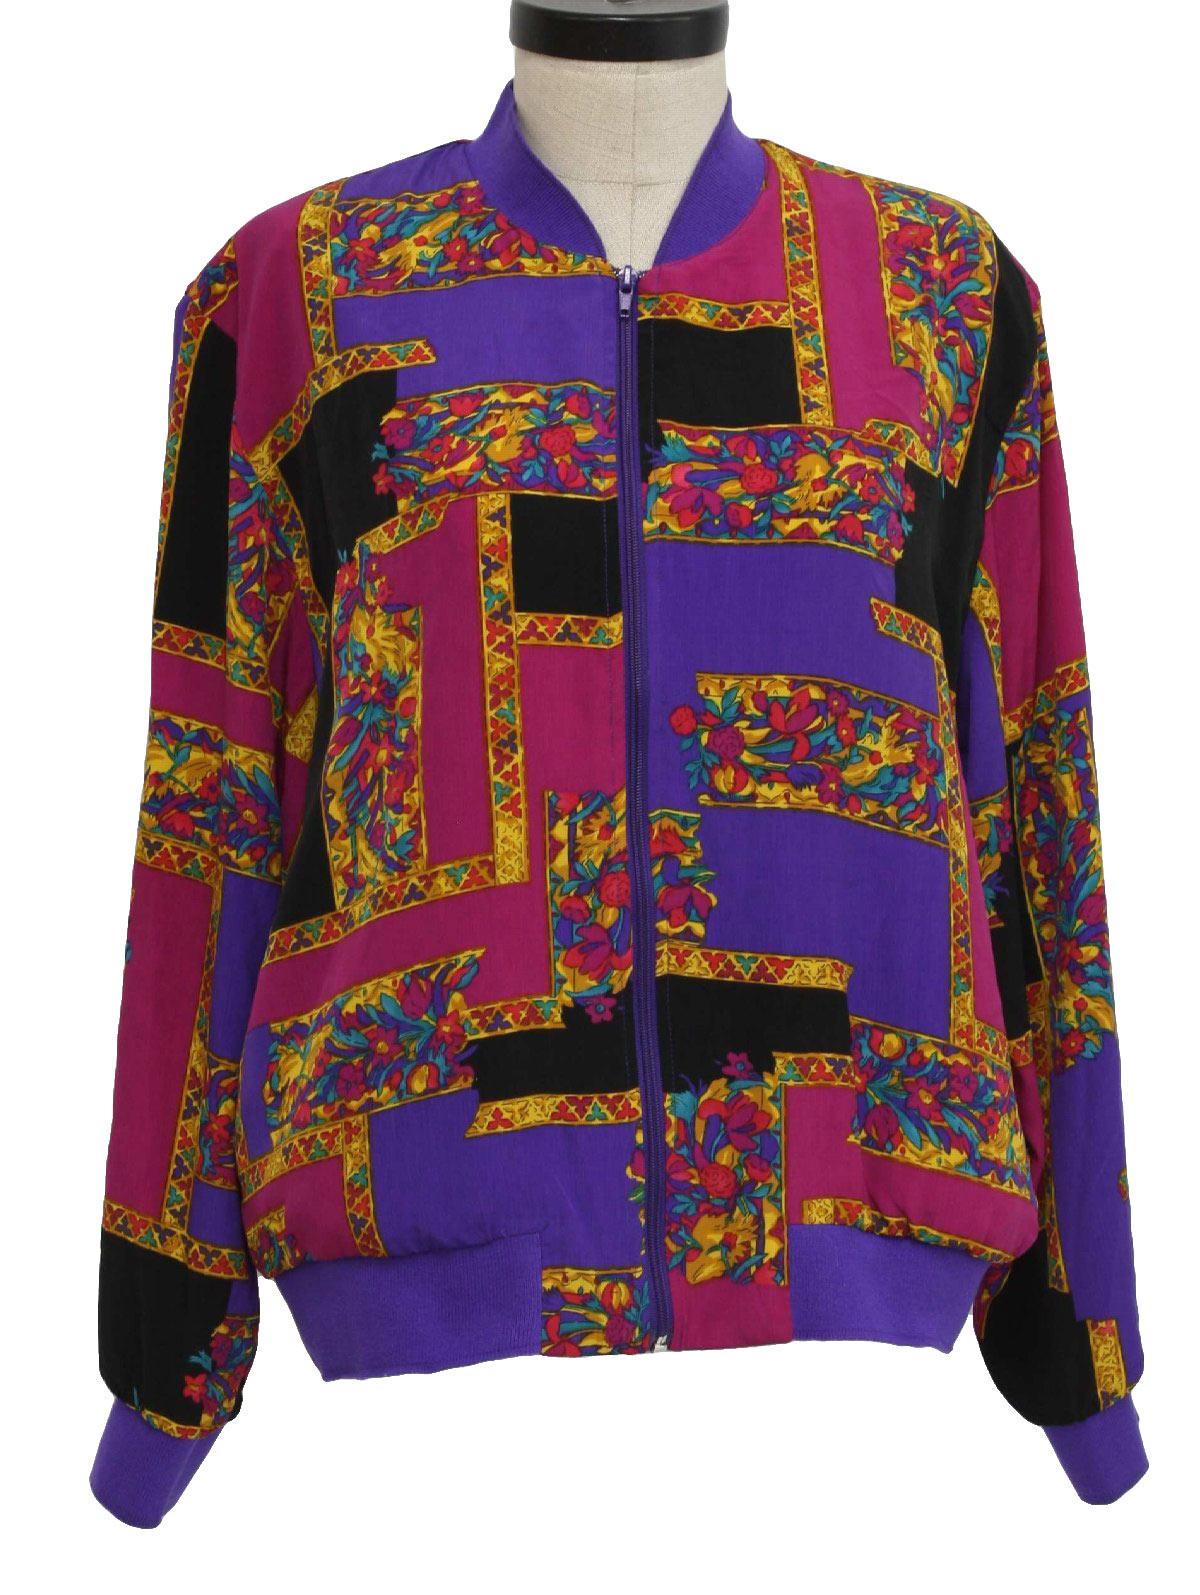 Vintage 1990's Jacket: 90s -Teddi- Womens violet, pink, black ...